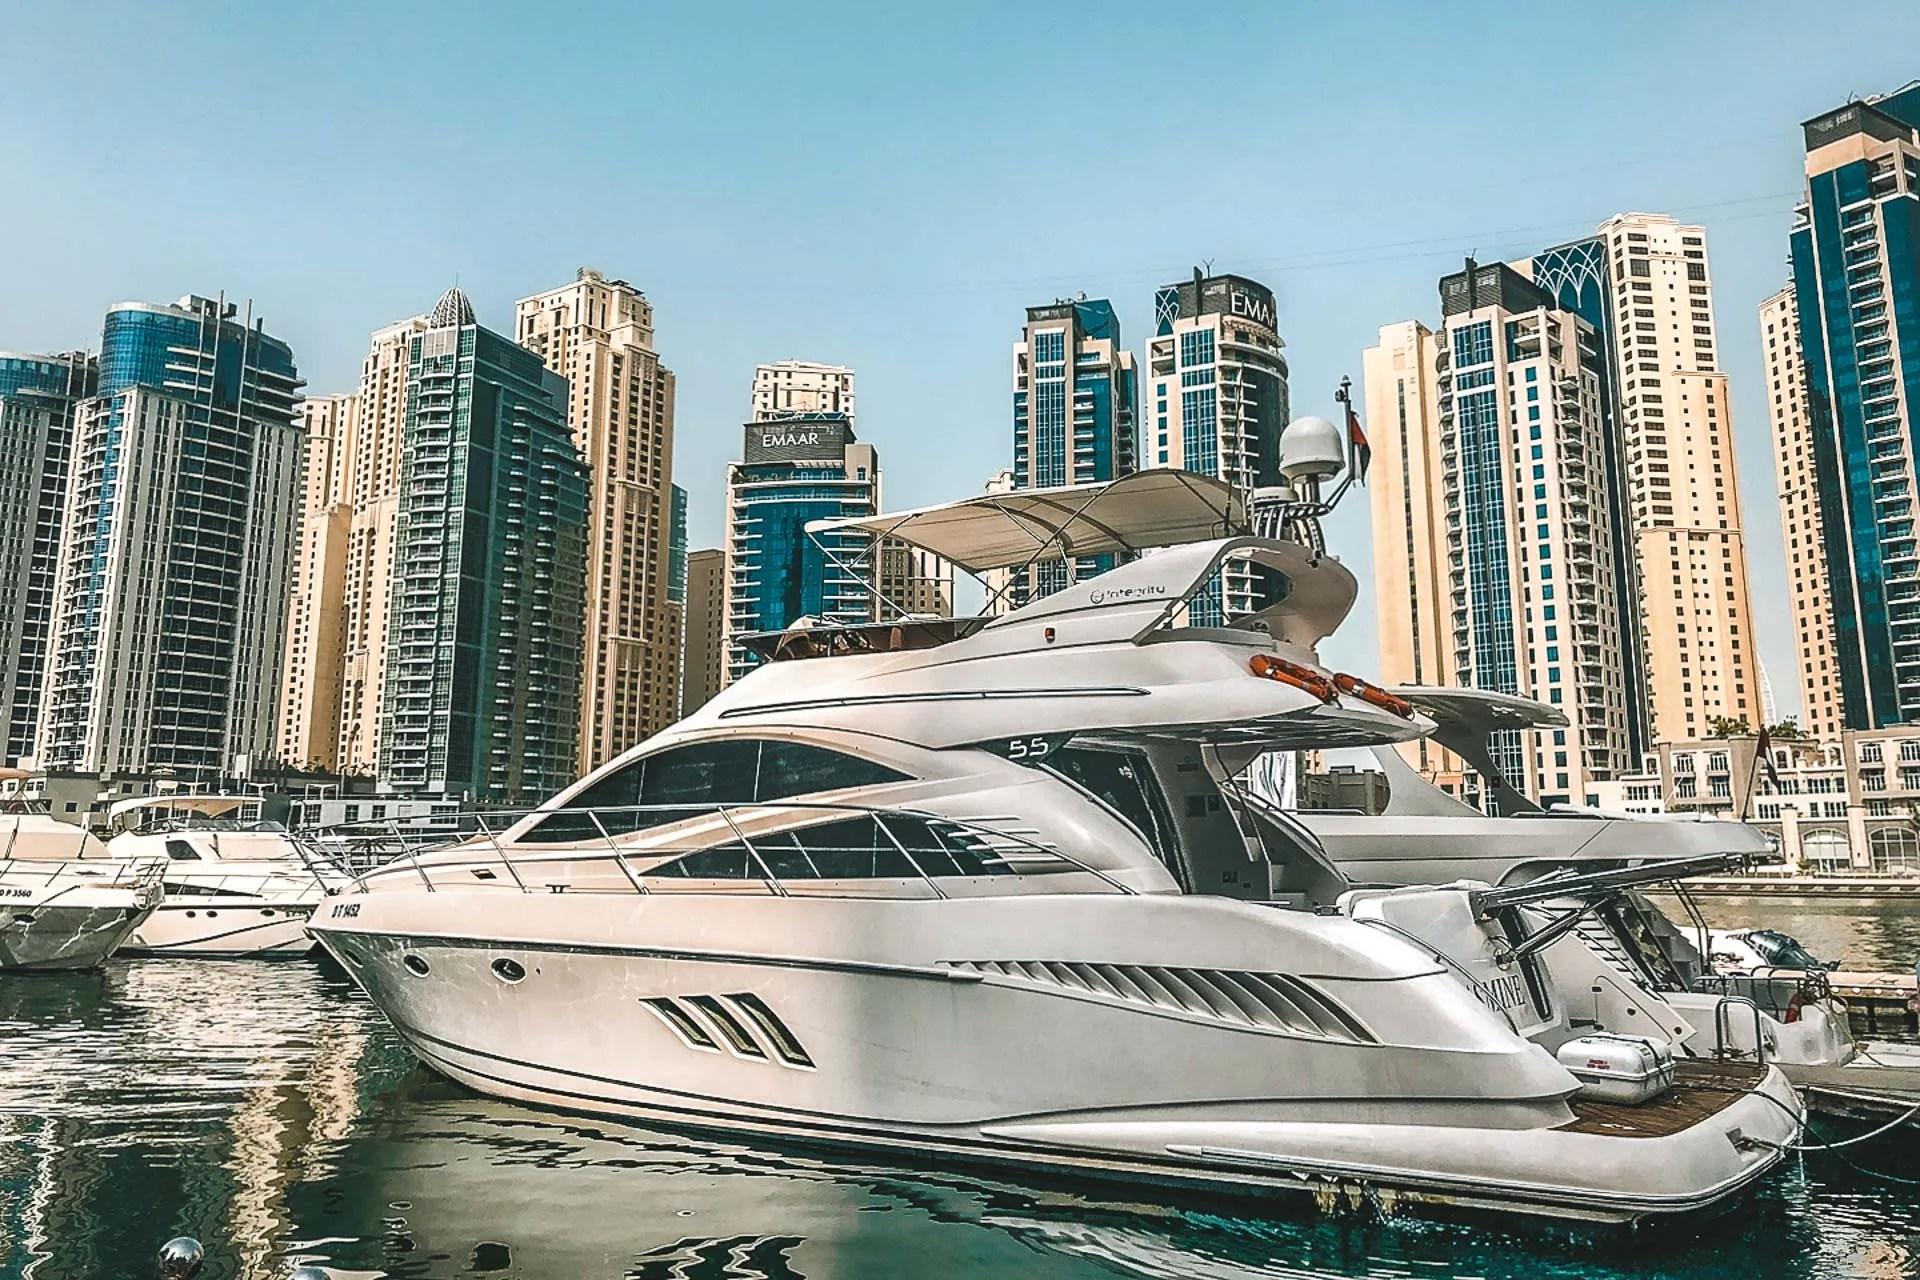 Dubai, Dubai yacht, Dubai yacht rental, Dubai yacht tour, Dubai tours, Dubai itinerary, 3 days in Dubai, Dubai on water, Water activity Dubai, Luxury yacht in Dubai